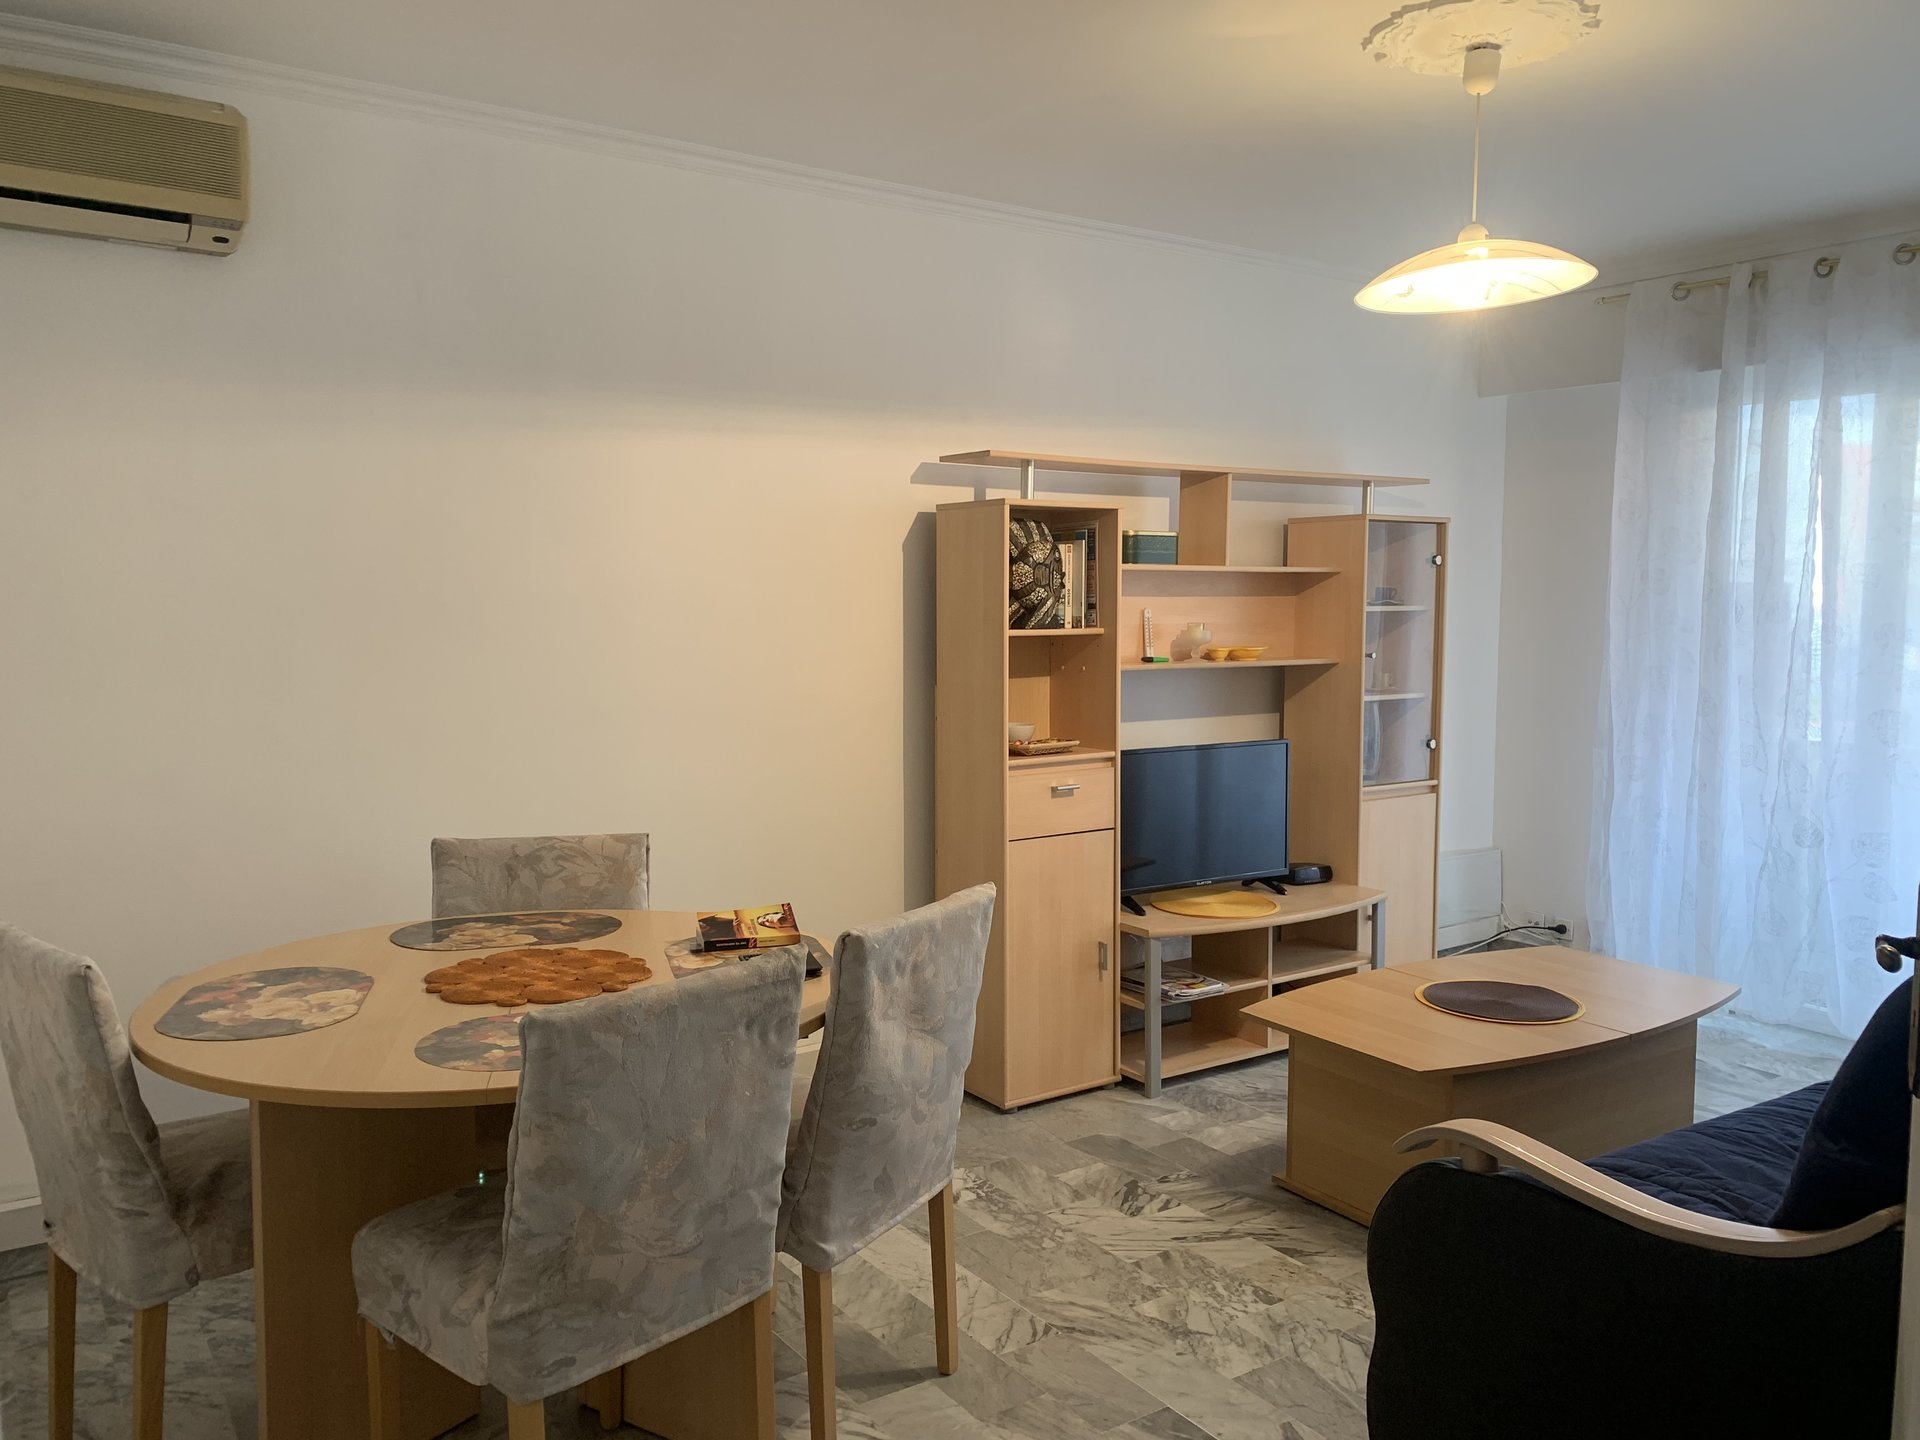 location Nice, 2 pièces meublé 53.84m² face faculté Saint Jean d'Angely